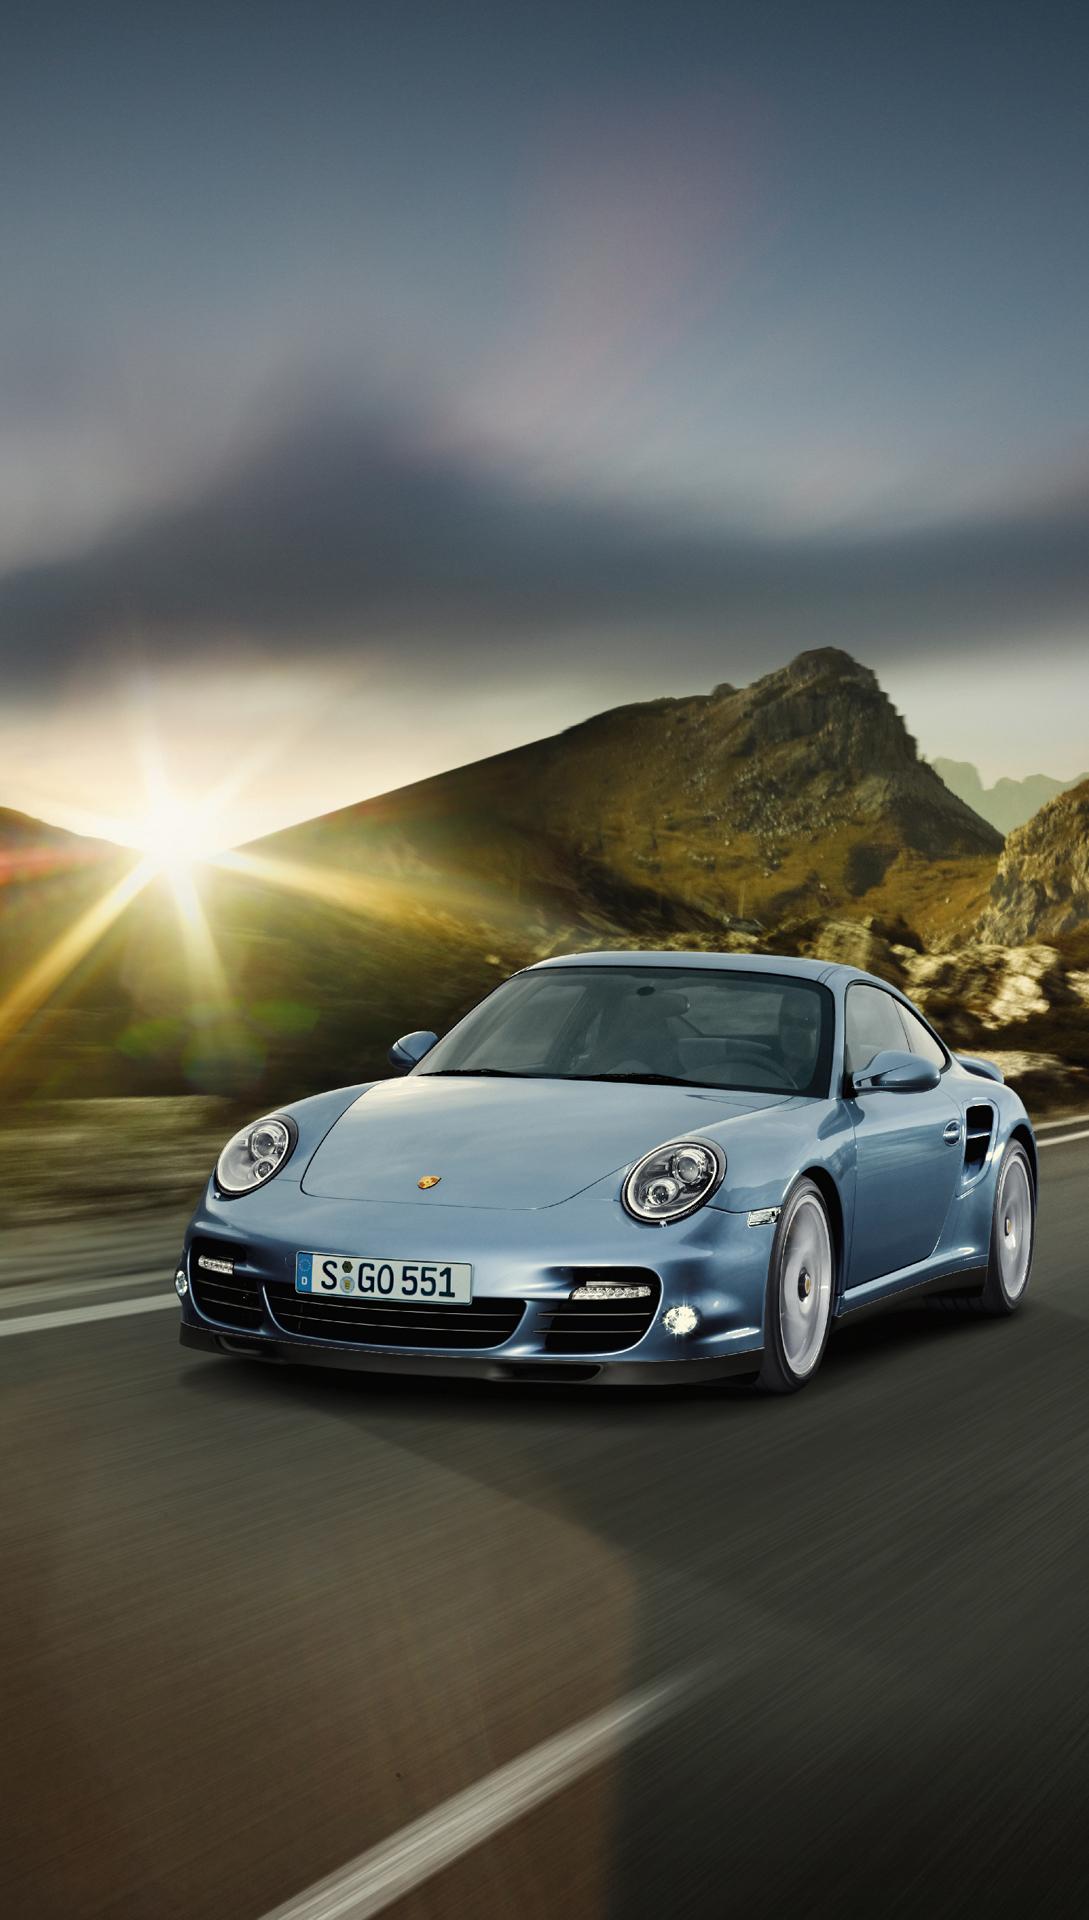 Porsche 911 turbo htc one wallpaper